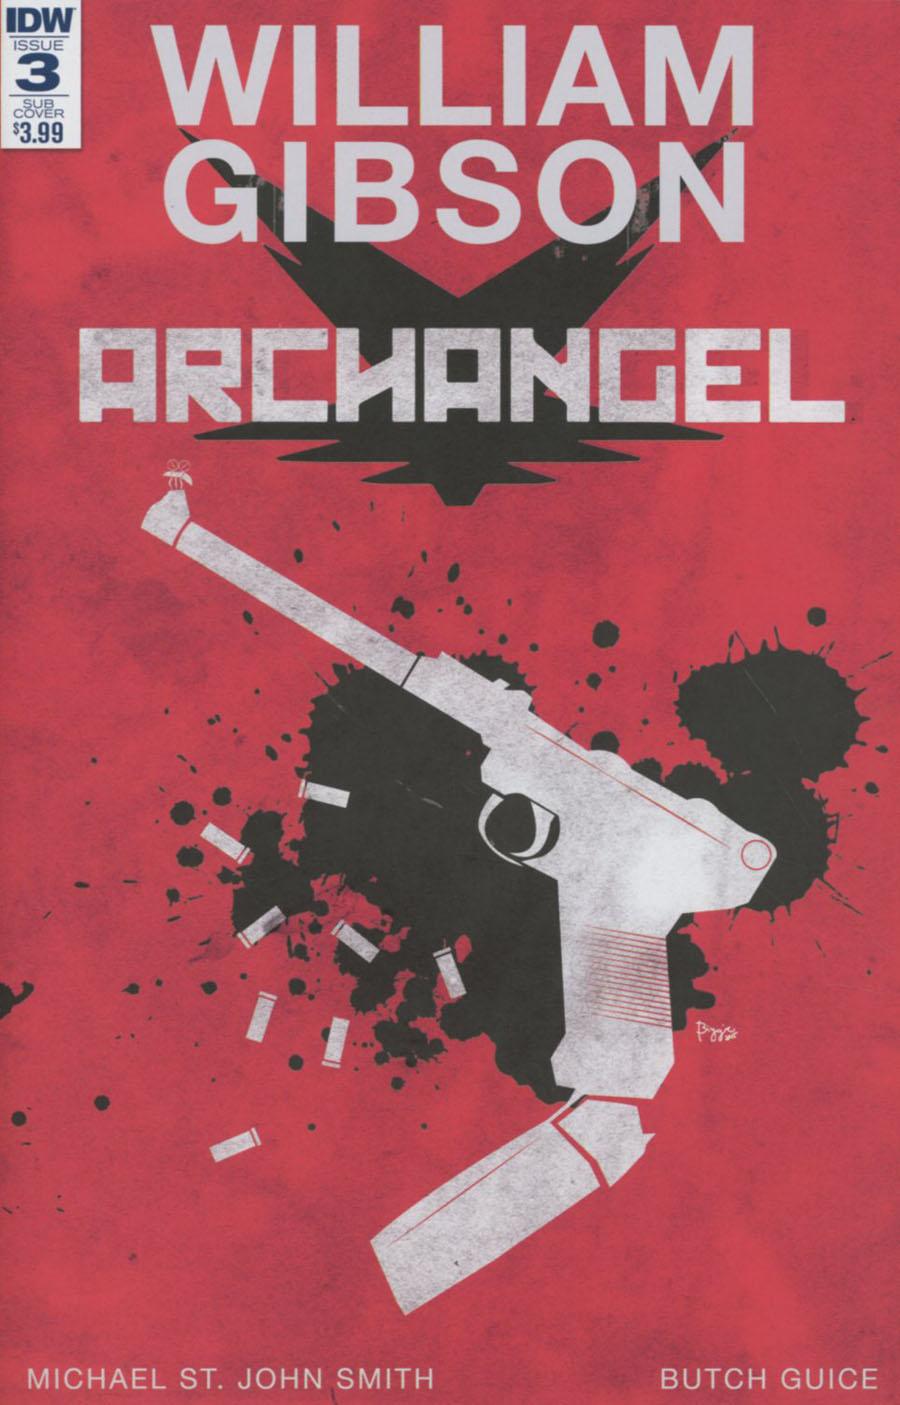 Archangel (IDW) #3 Cover C Variant James Biggie Paperback Subscription Cover